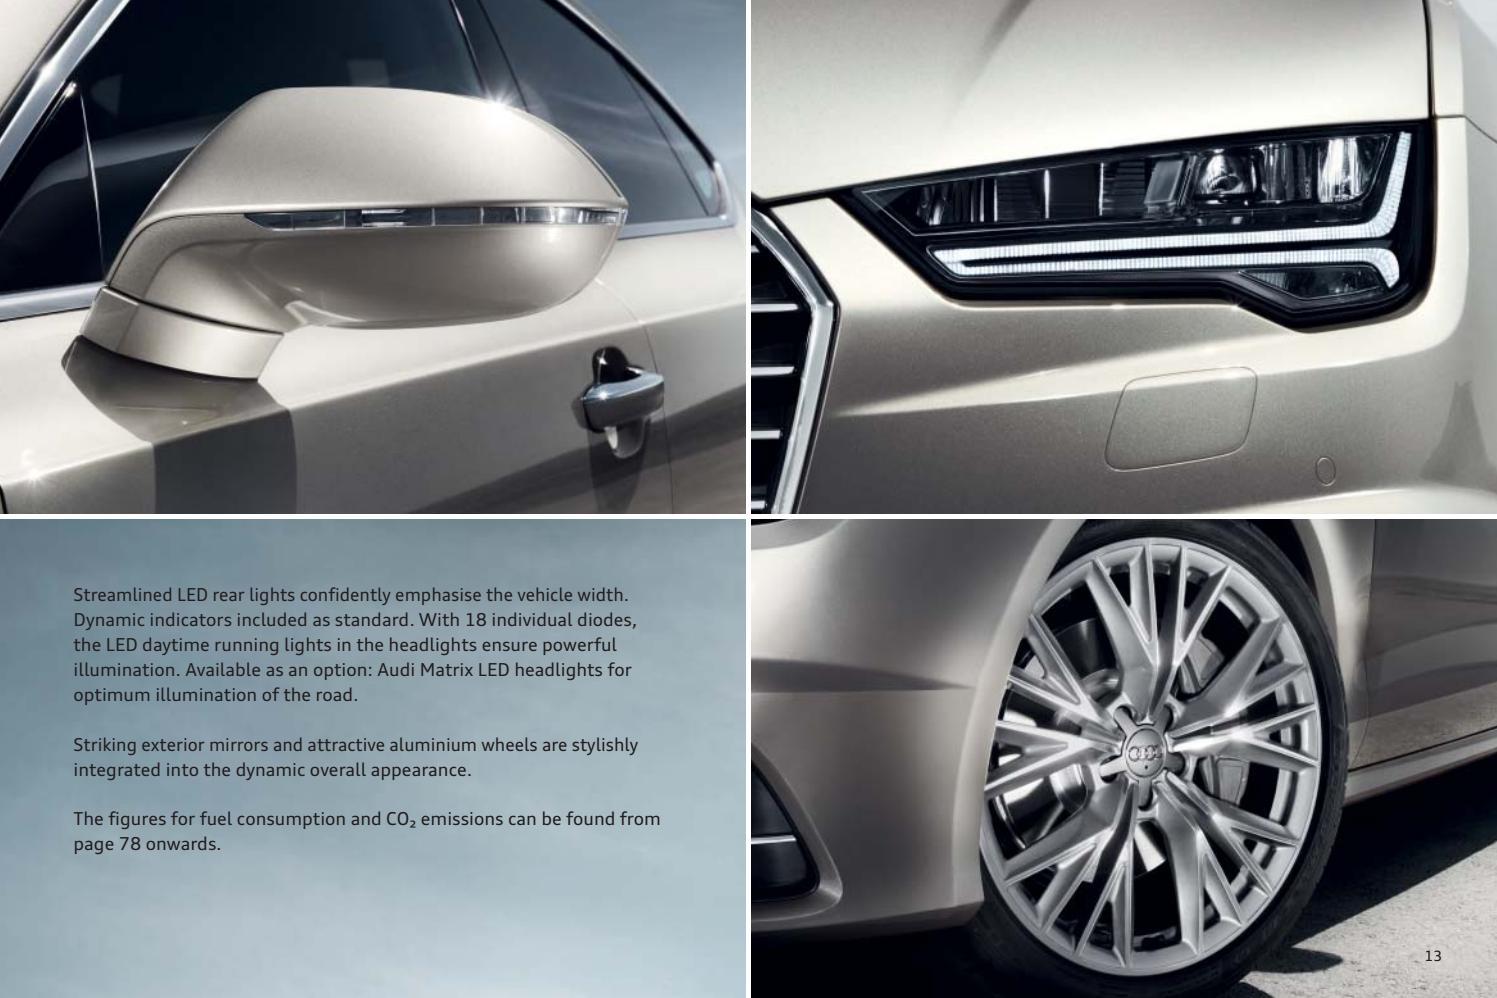 Audi A7 Ja S7 Esite 42017 By Avidly Agency Issuu